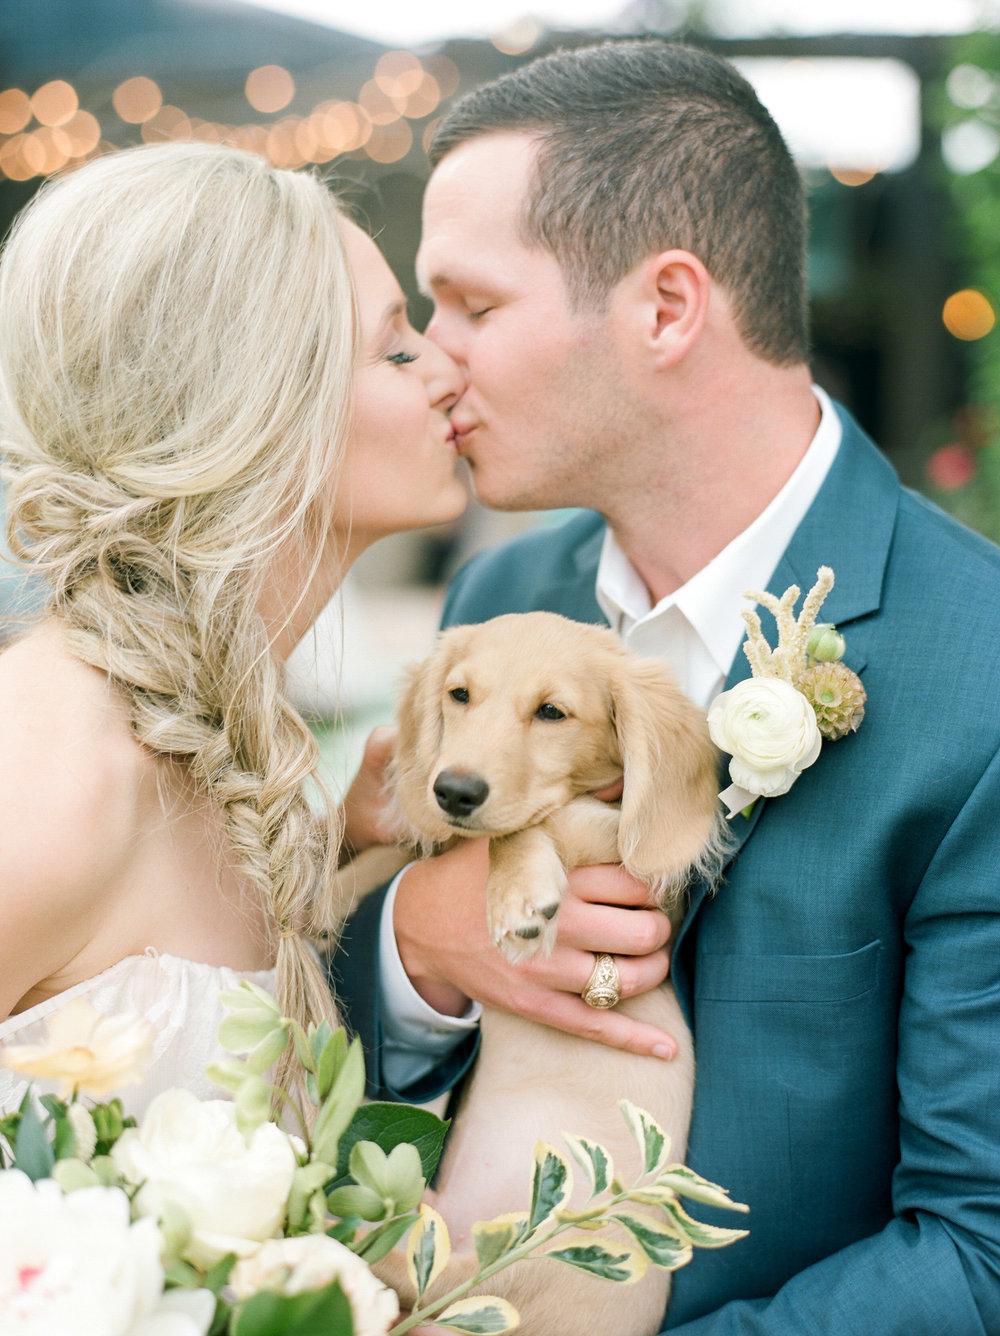 Houston-Wedding-Photographer-Fine-Art-Film-Destination-Style-Me-Pretty-Austin-Dallas-New-Orleans-Dana-Fernandez-Photography-8.jpg